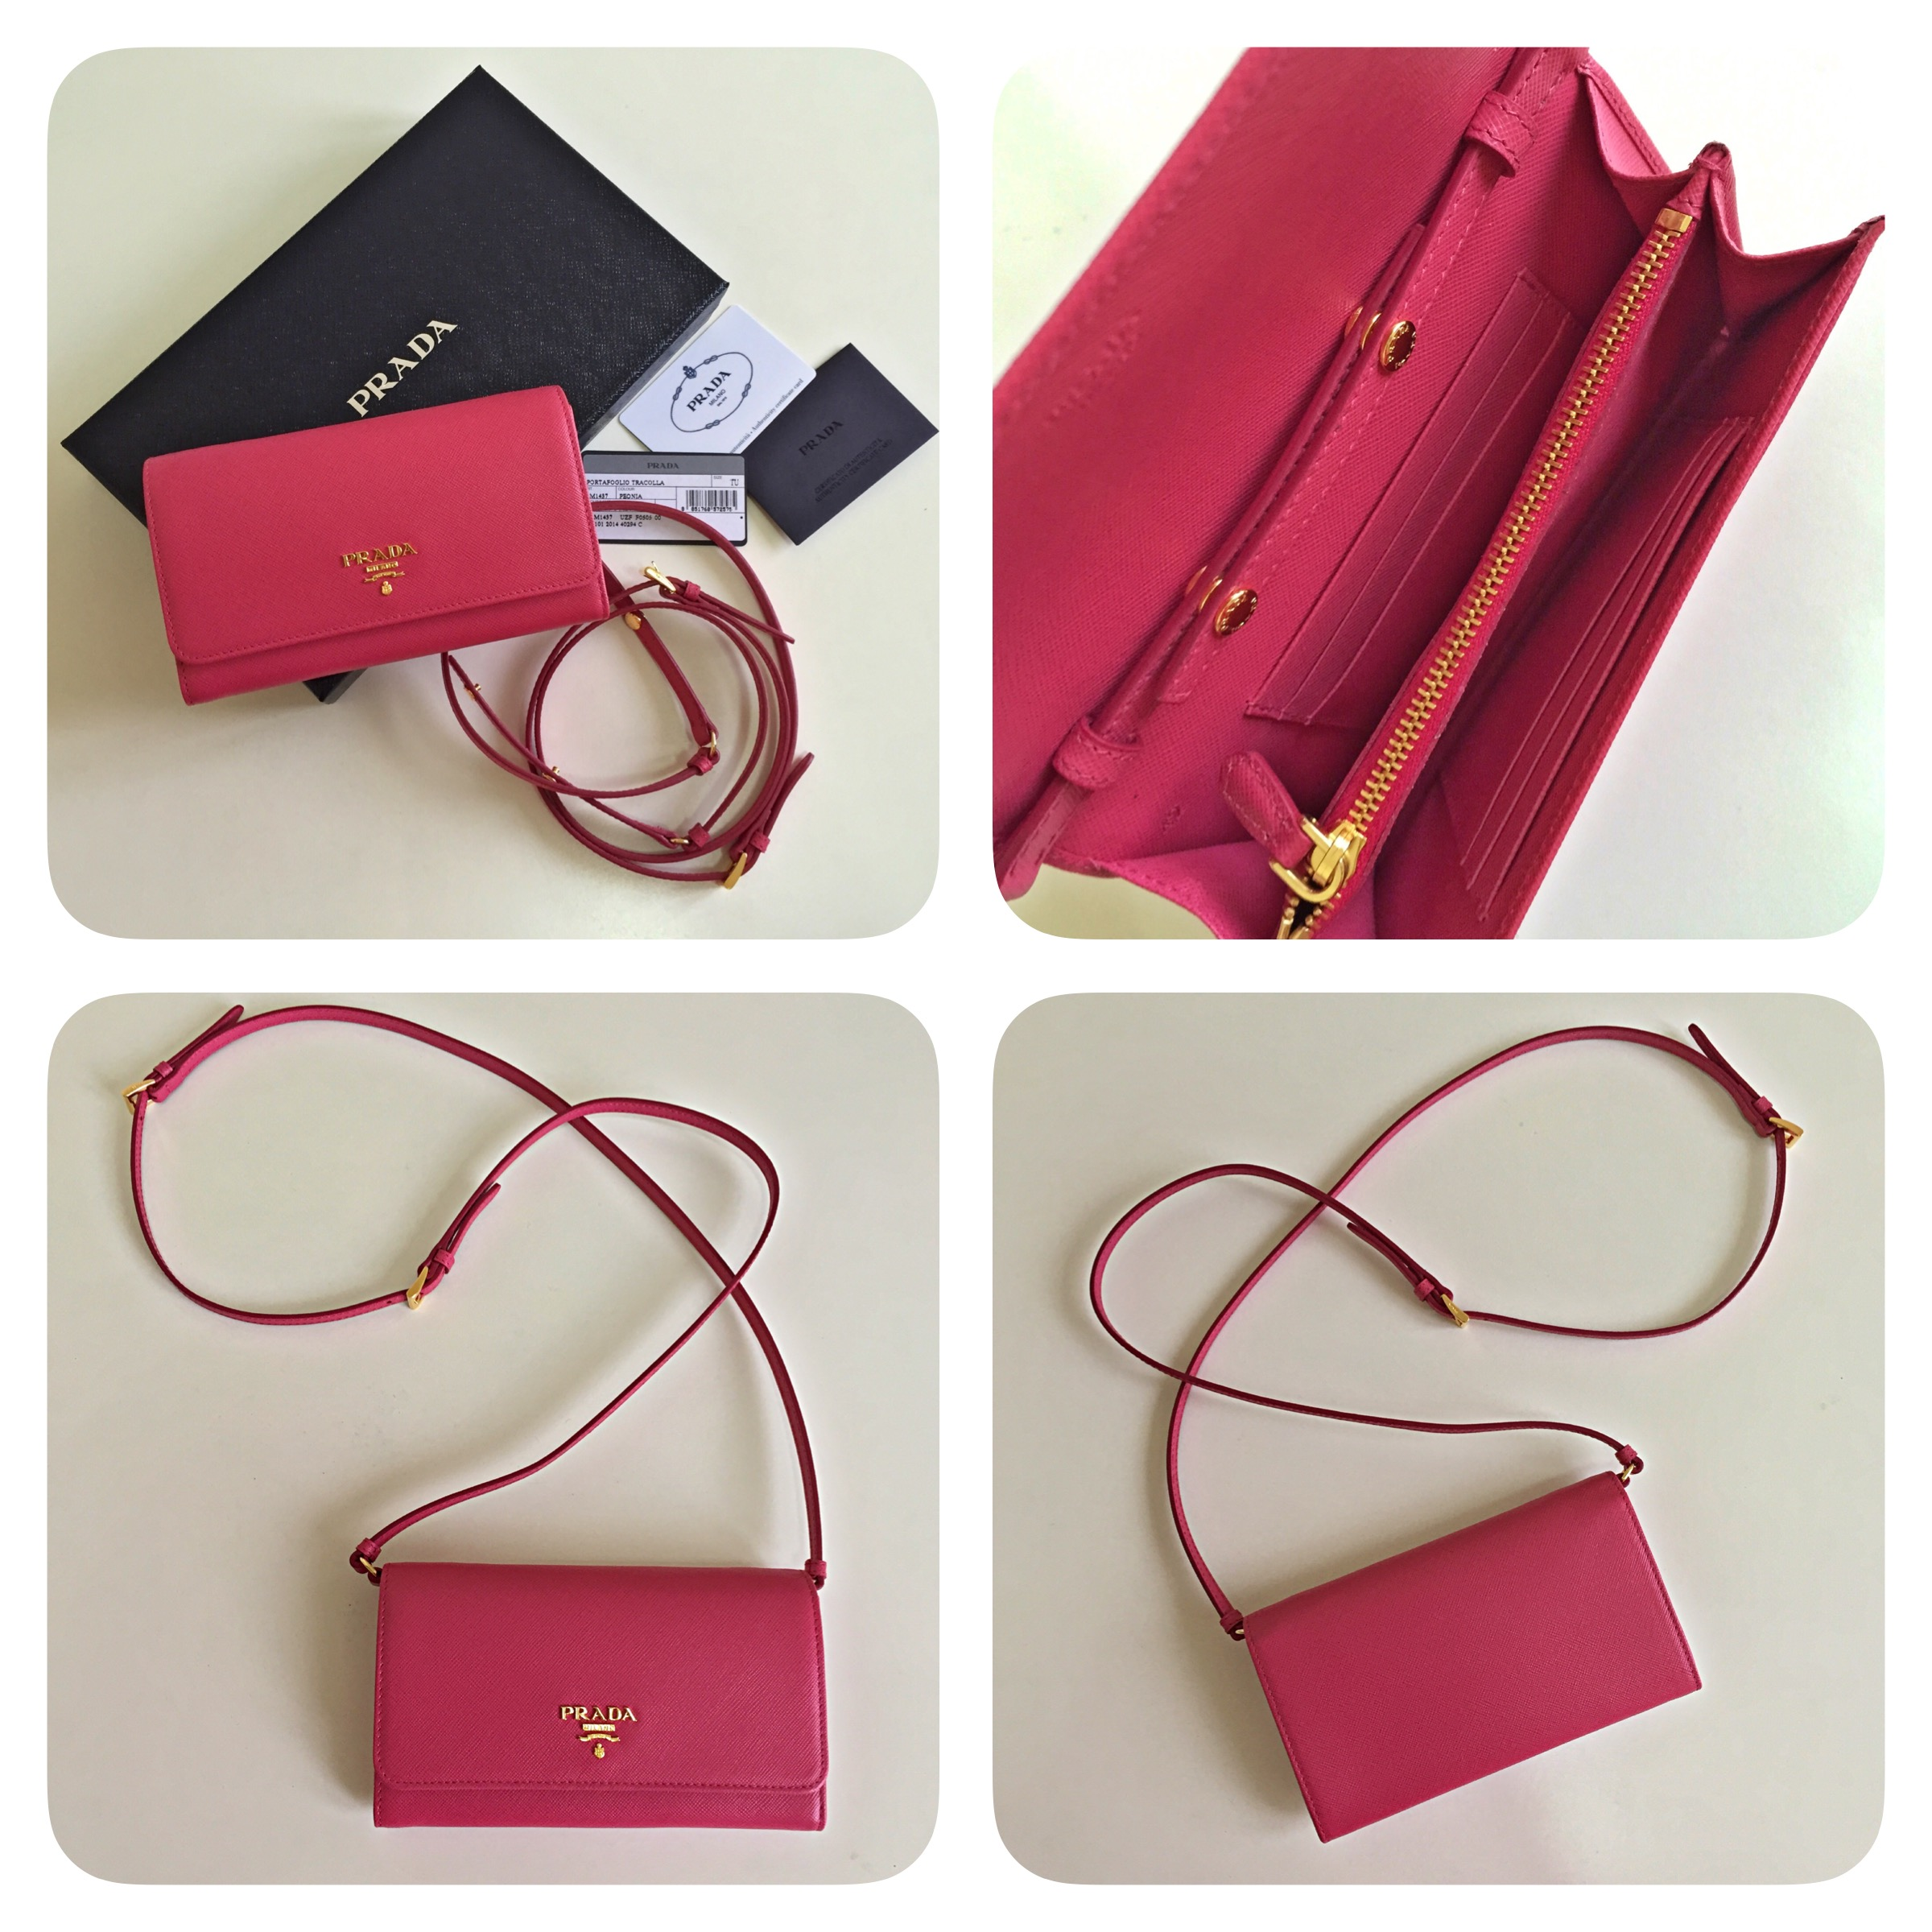 580a76c3bf ... PRADA Saffiano Metal Peonia Mini Crossbody Bag - Thumbnail 3 ...